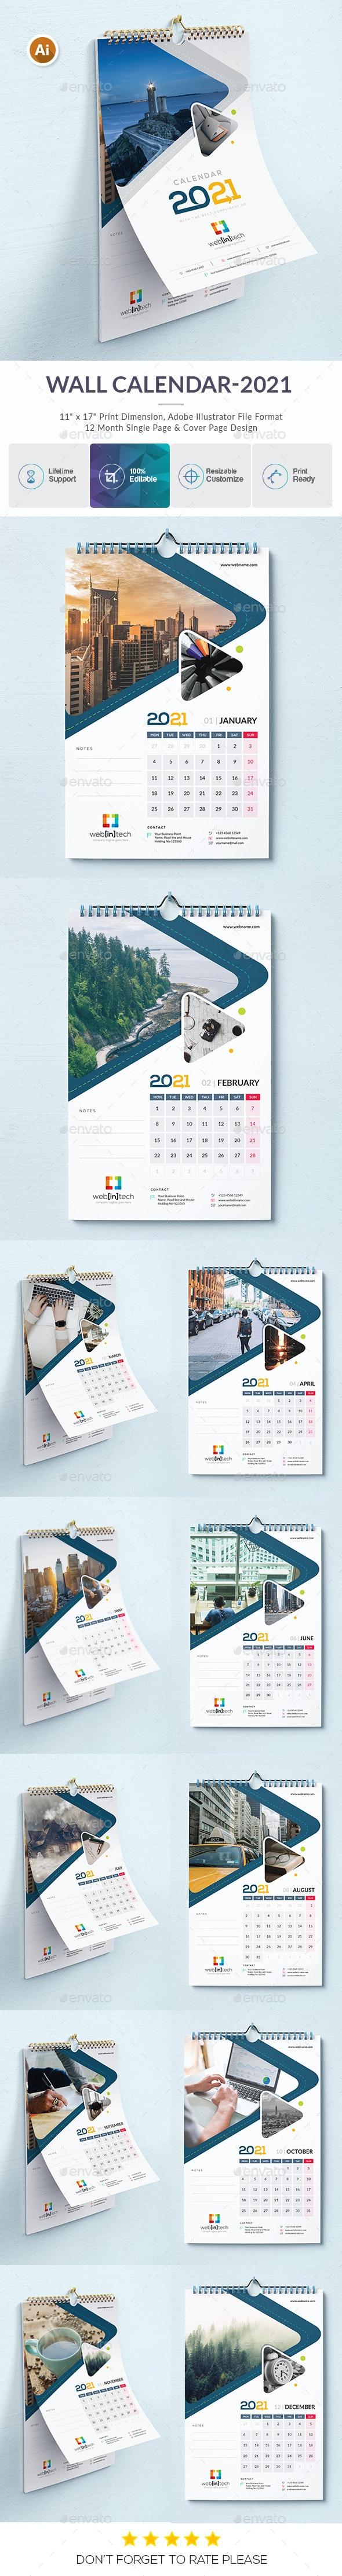 2021 Wall Calendar - Calendars Stationery